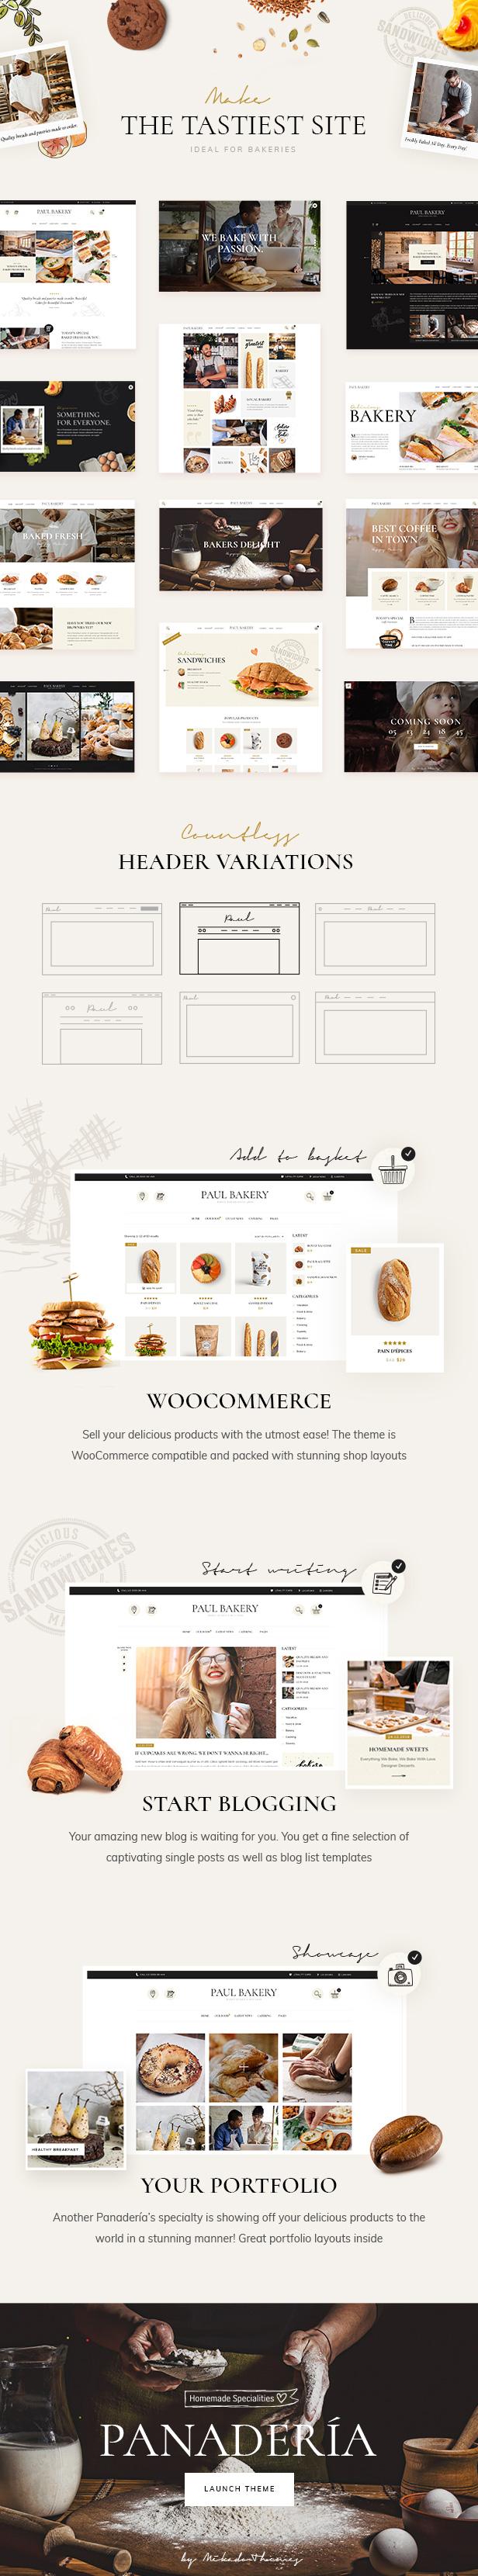 Panadería - Thema Bäckerei und Konditorei - 1